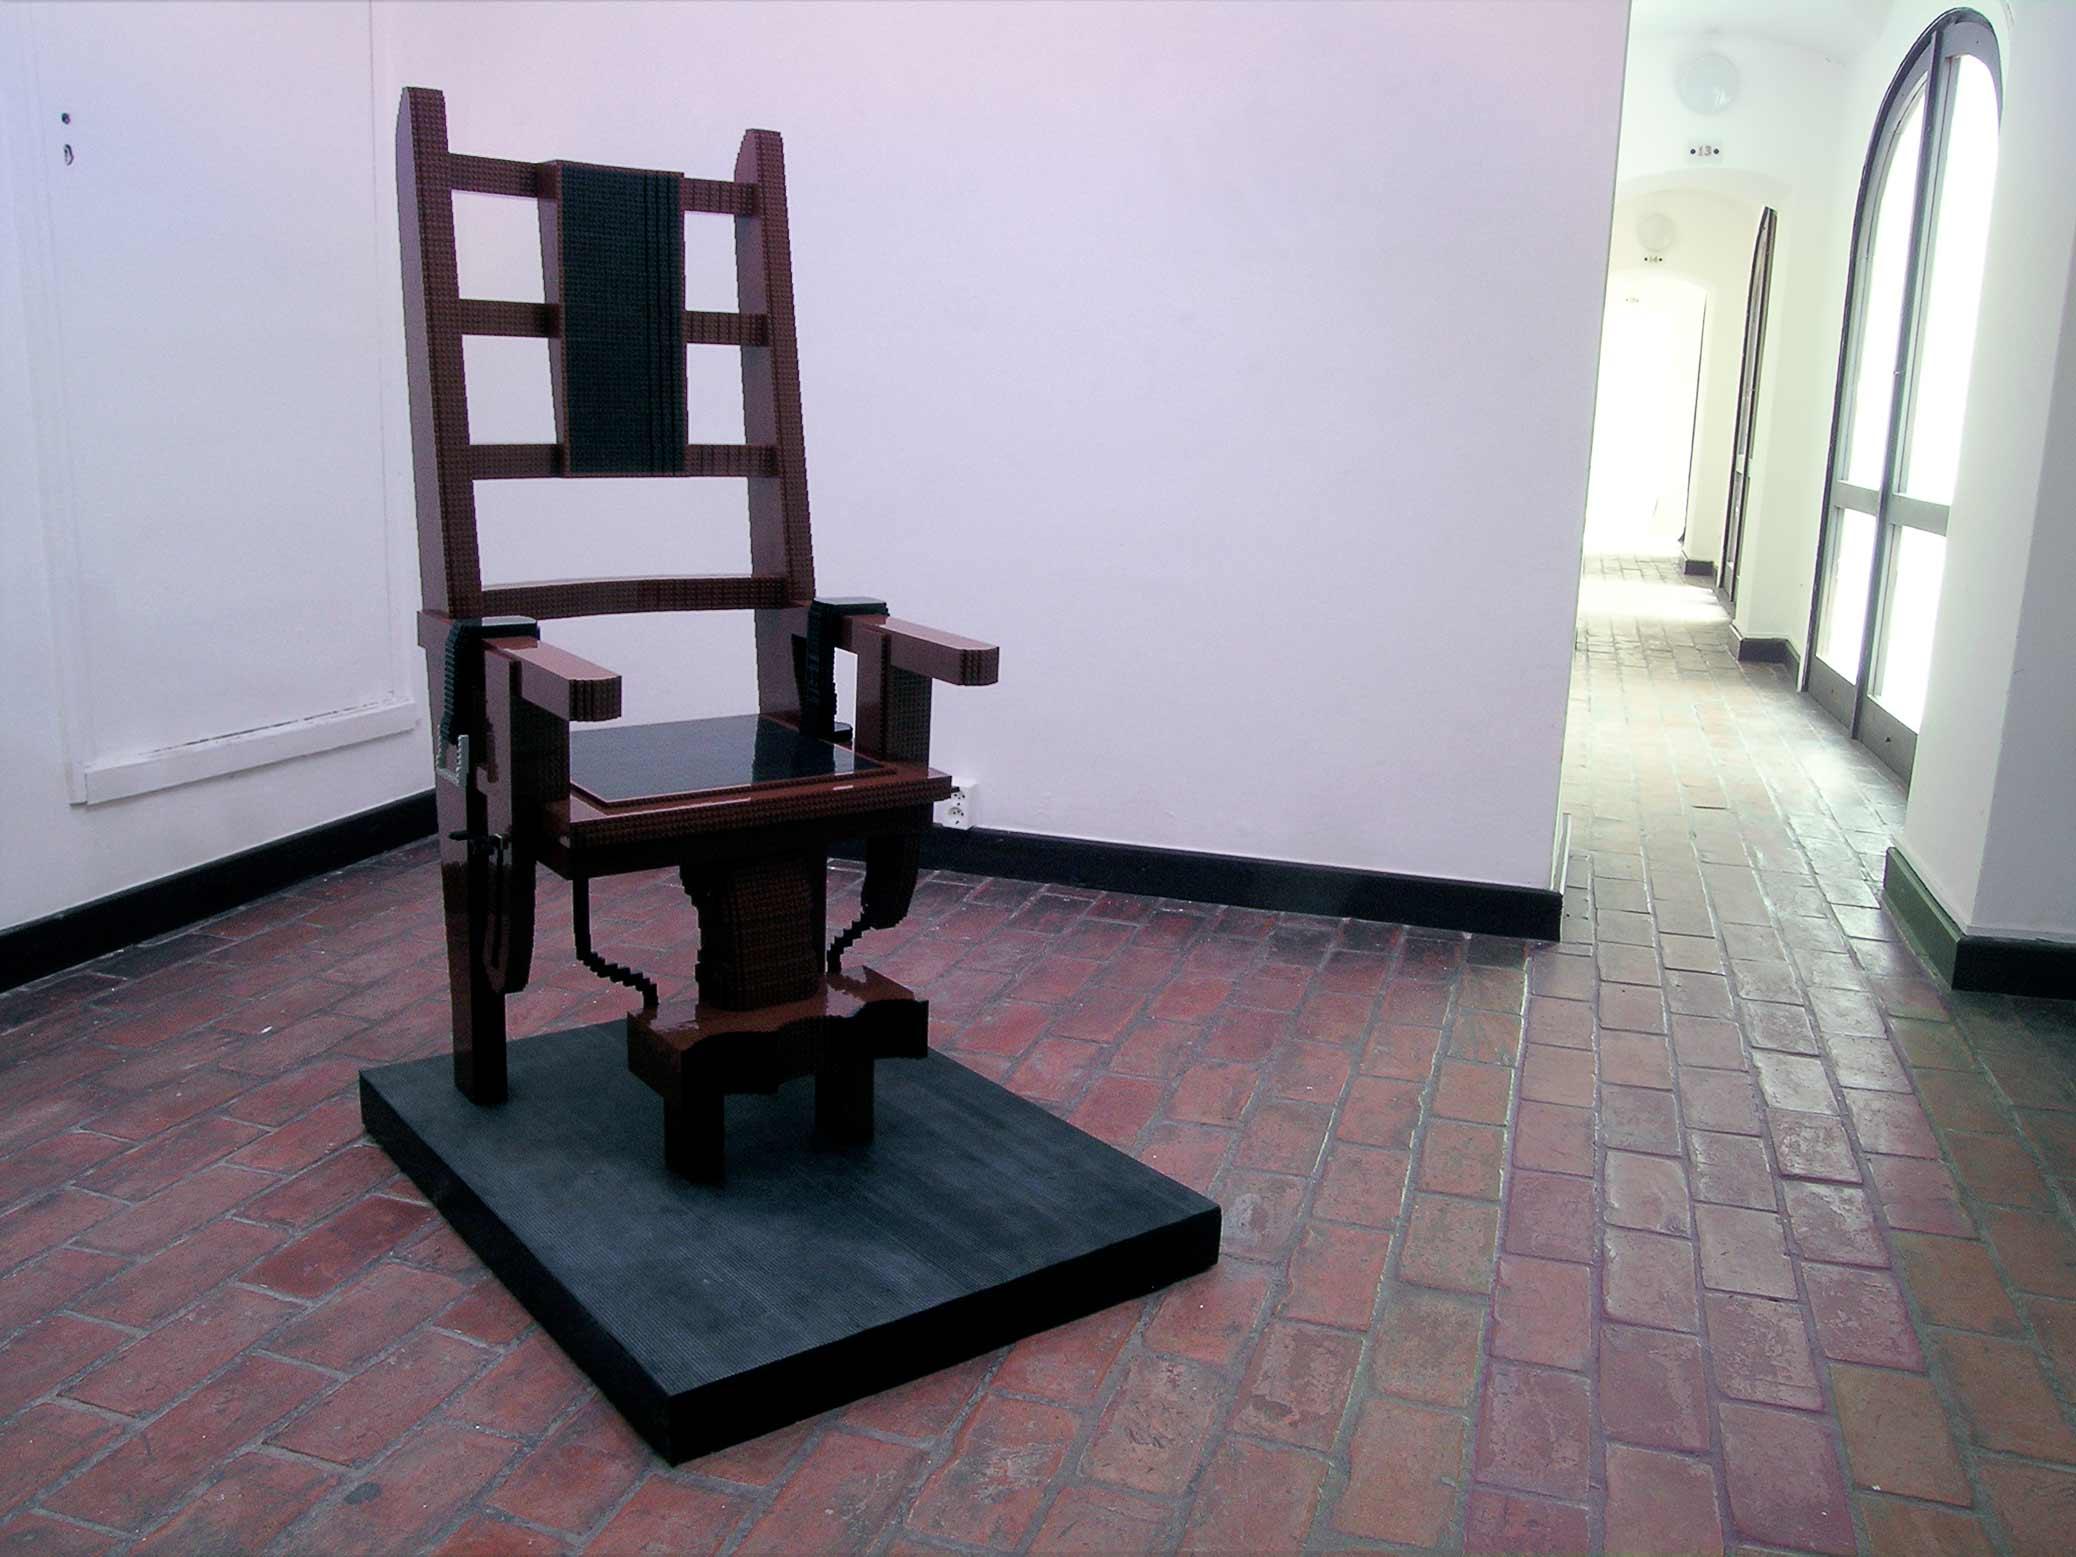 Elektrisk stol, skulptur i LEGO, på Budapest Galéria Kiálítóháza.